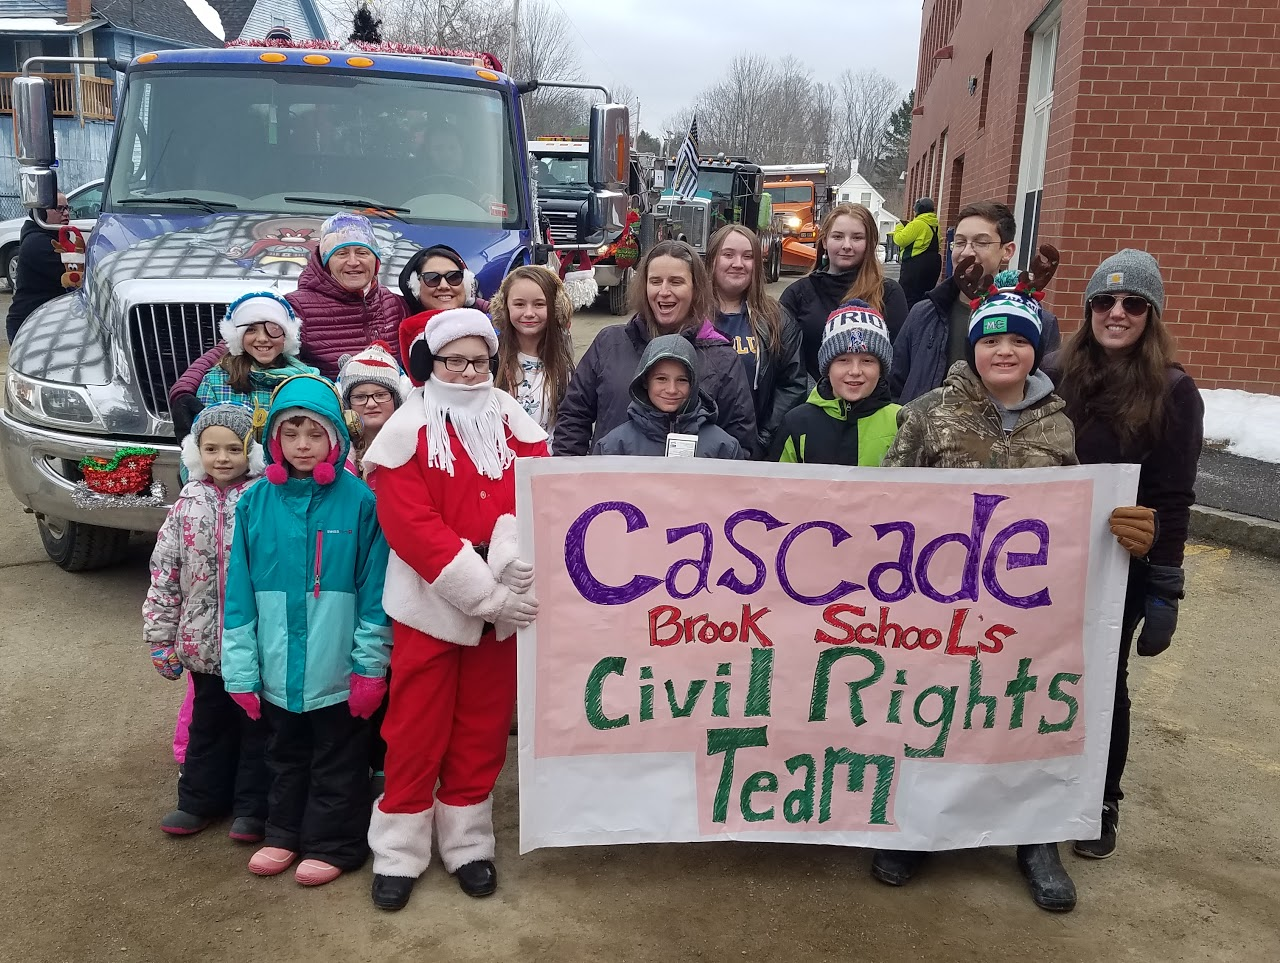 Cascade Brook Civil Rights Team